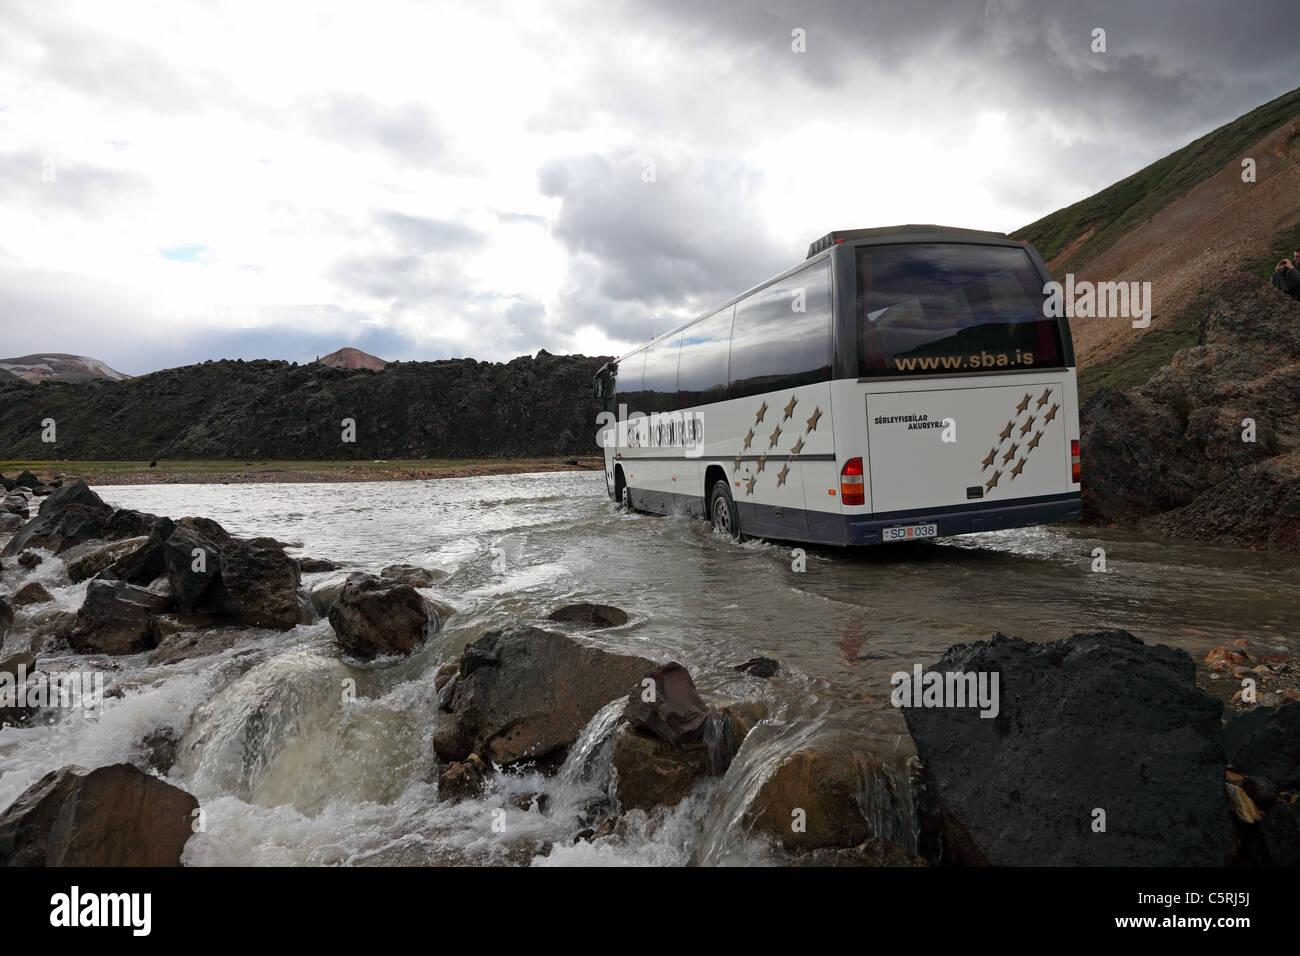 Bus Driving Through the River Namskvisl at Landmannalaugar in the Fjallabak Area of Iceland - Stock Image